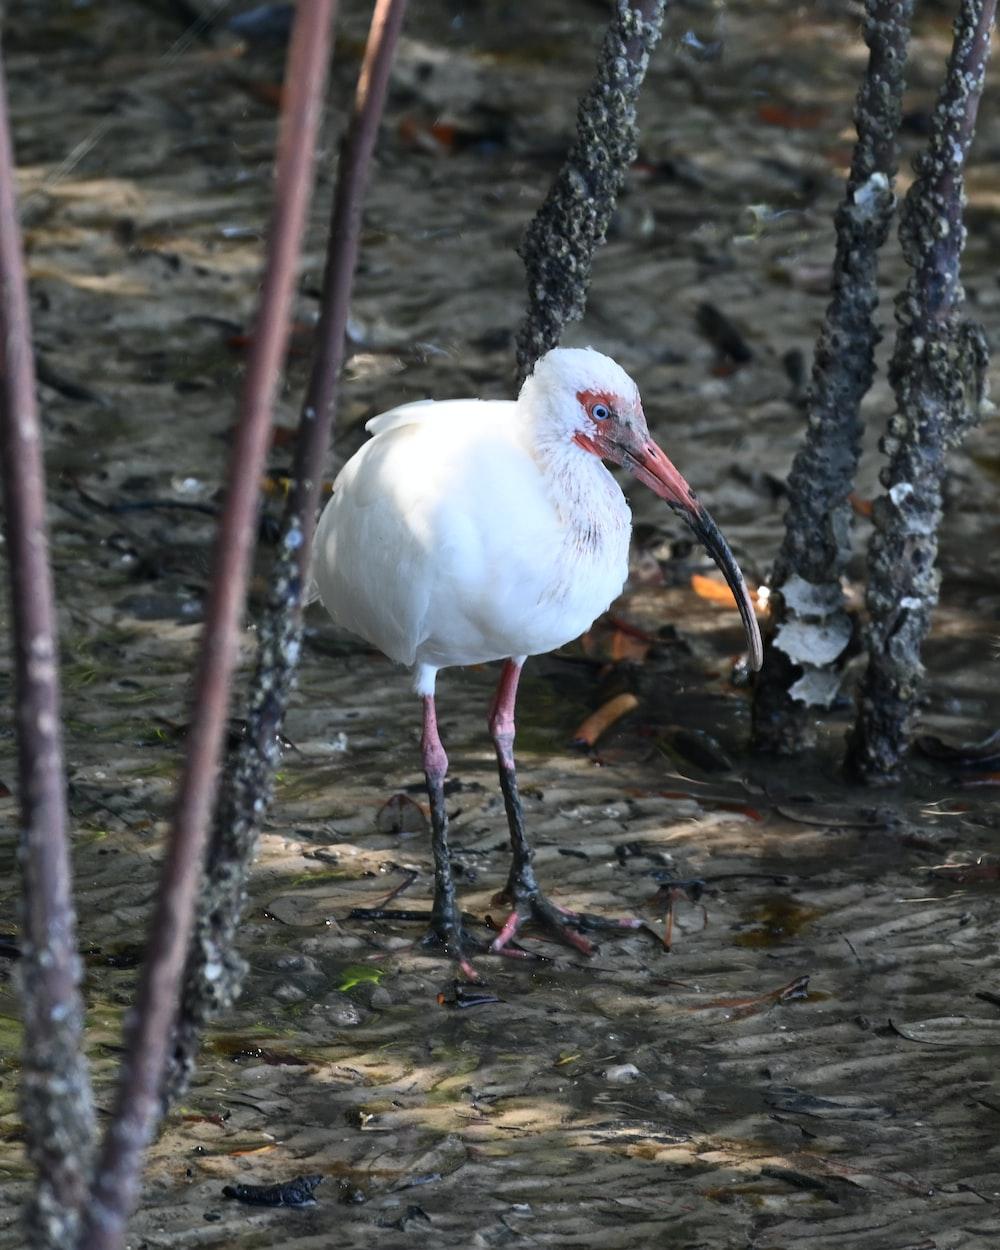 white bird on water falls